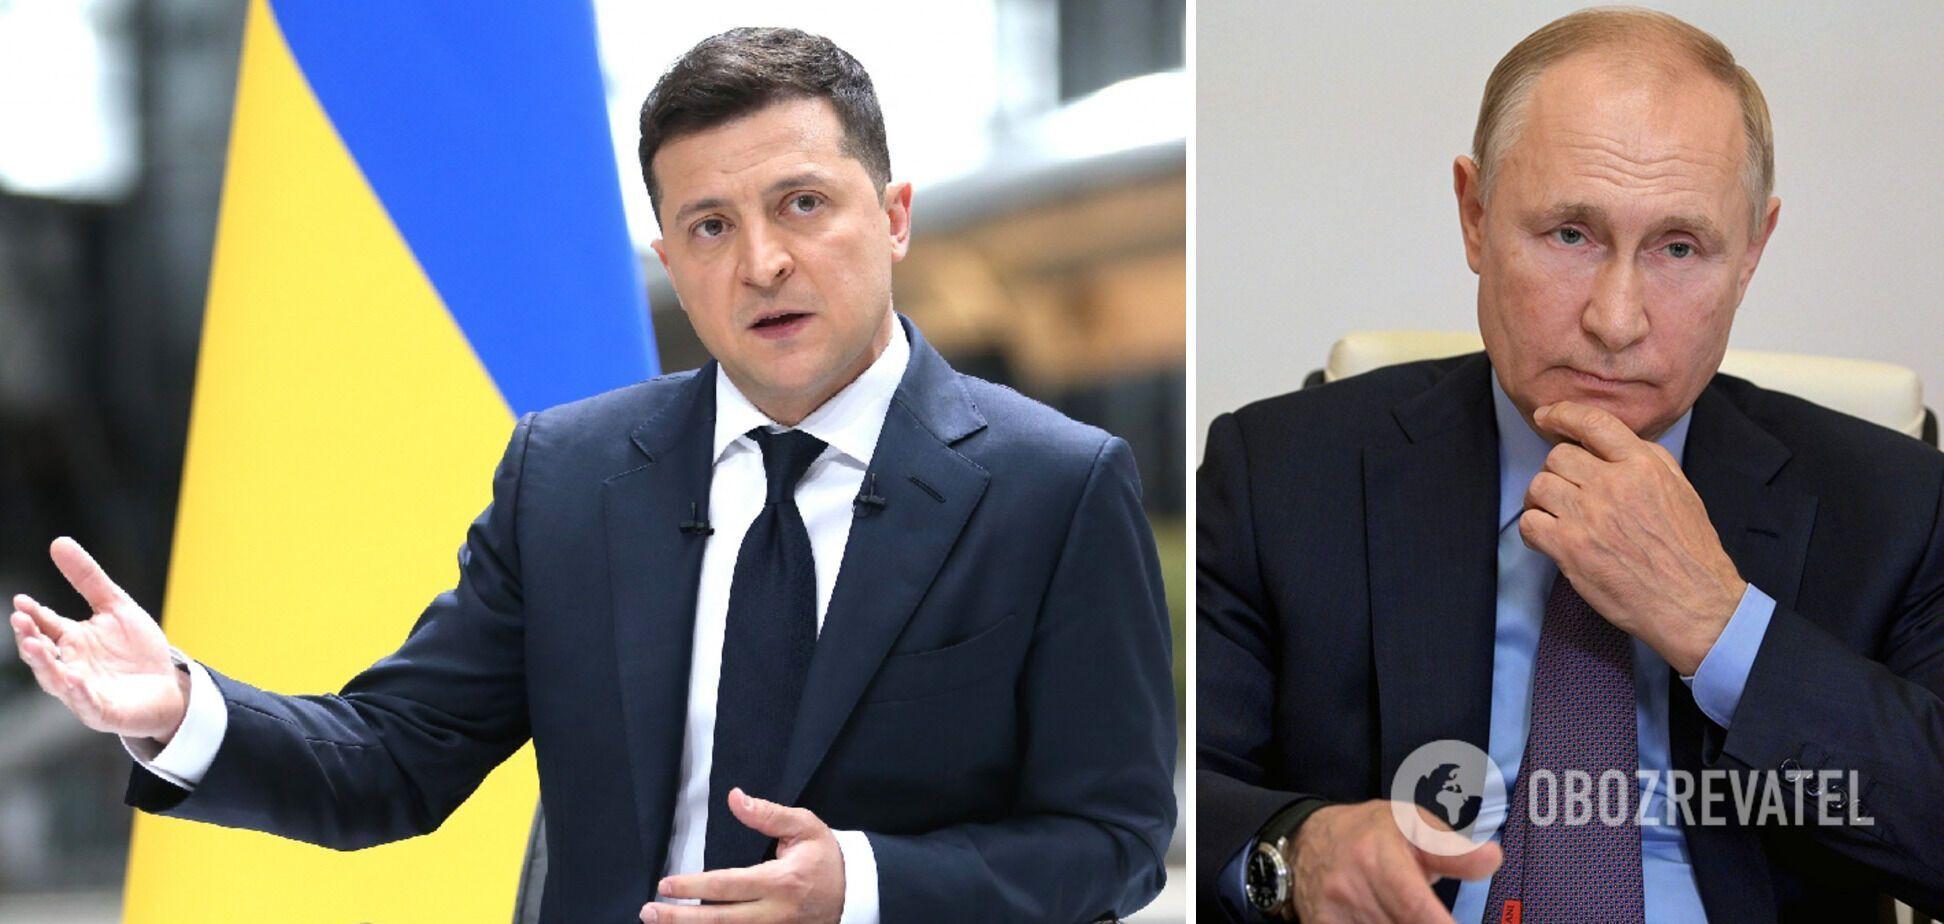 Зеленский предлагал встречу с Путиным тет-а-тет